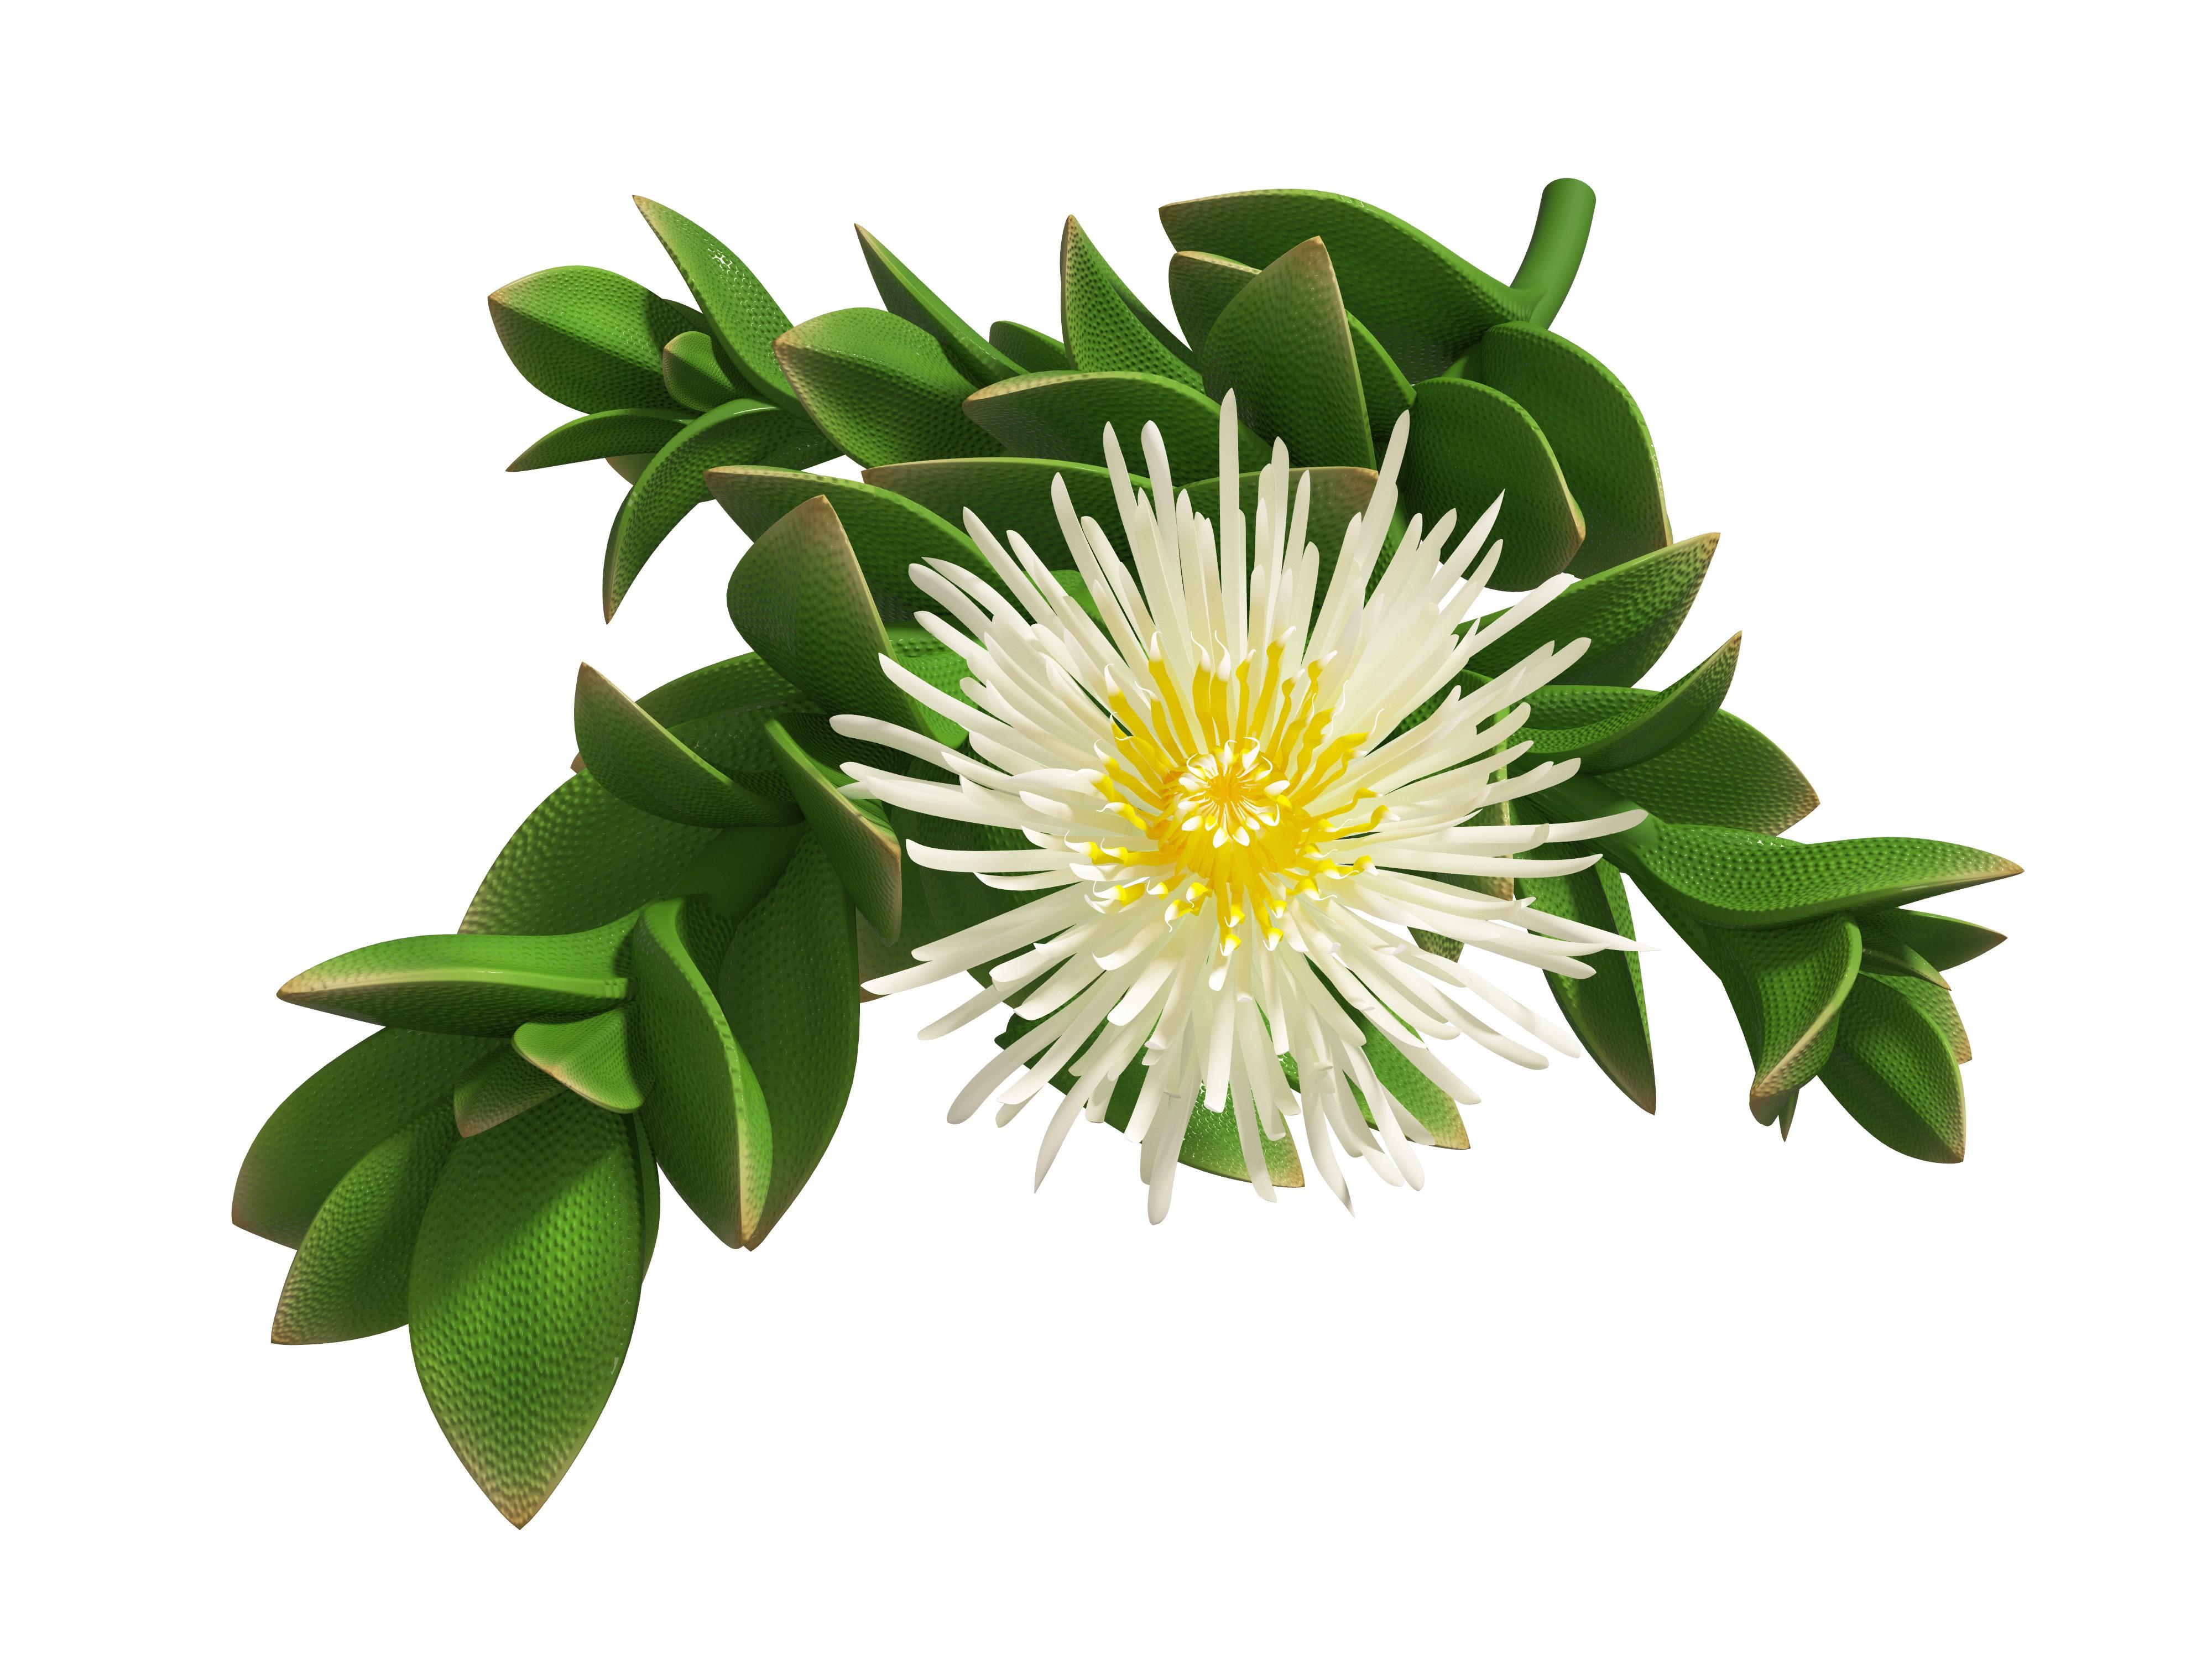 Create a Kanna plant image